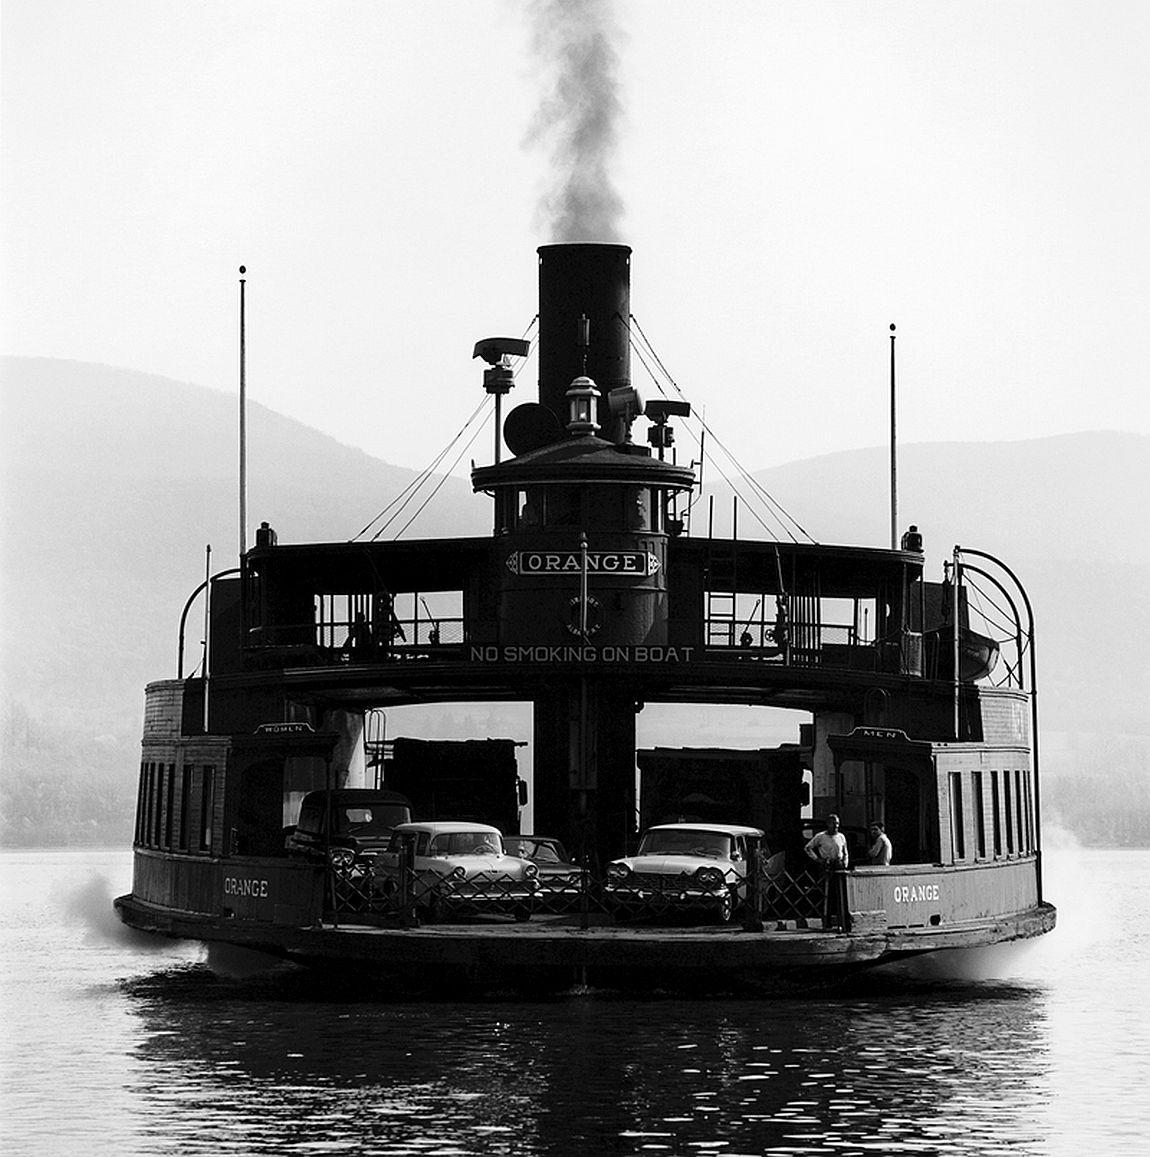 Ferryboat Orange Newburgh Beacon Ferry in Hudson River Newburgh New York 1963 NBF-1163-182